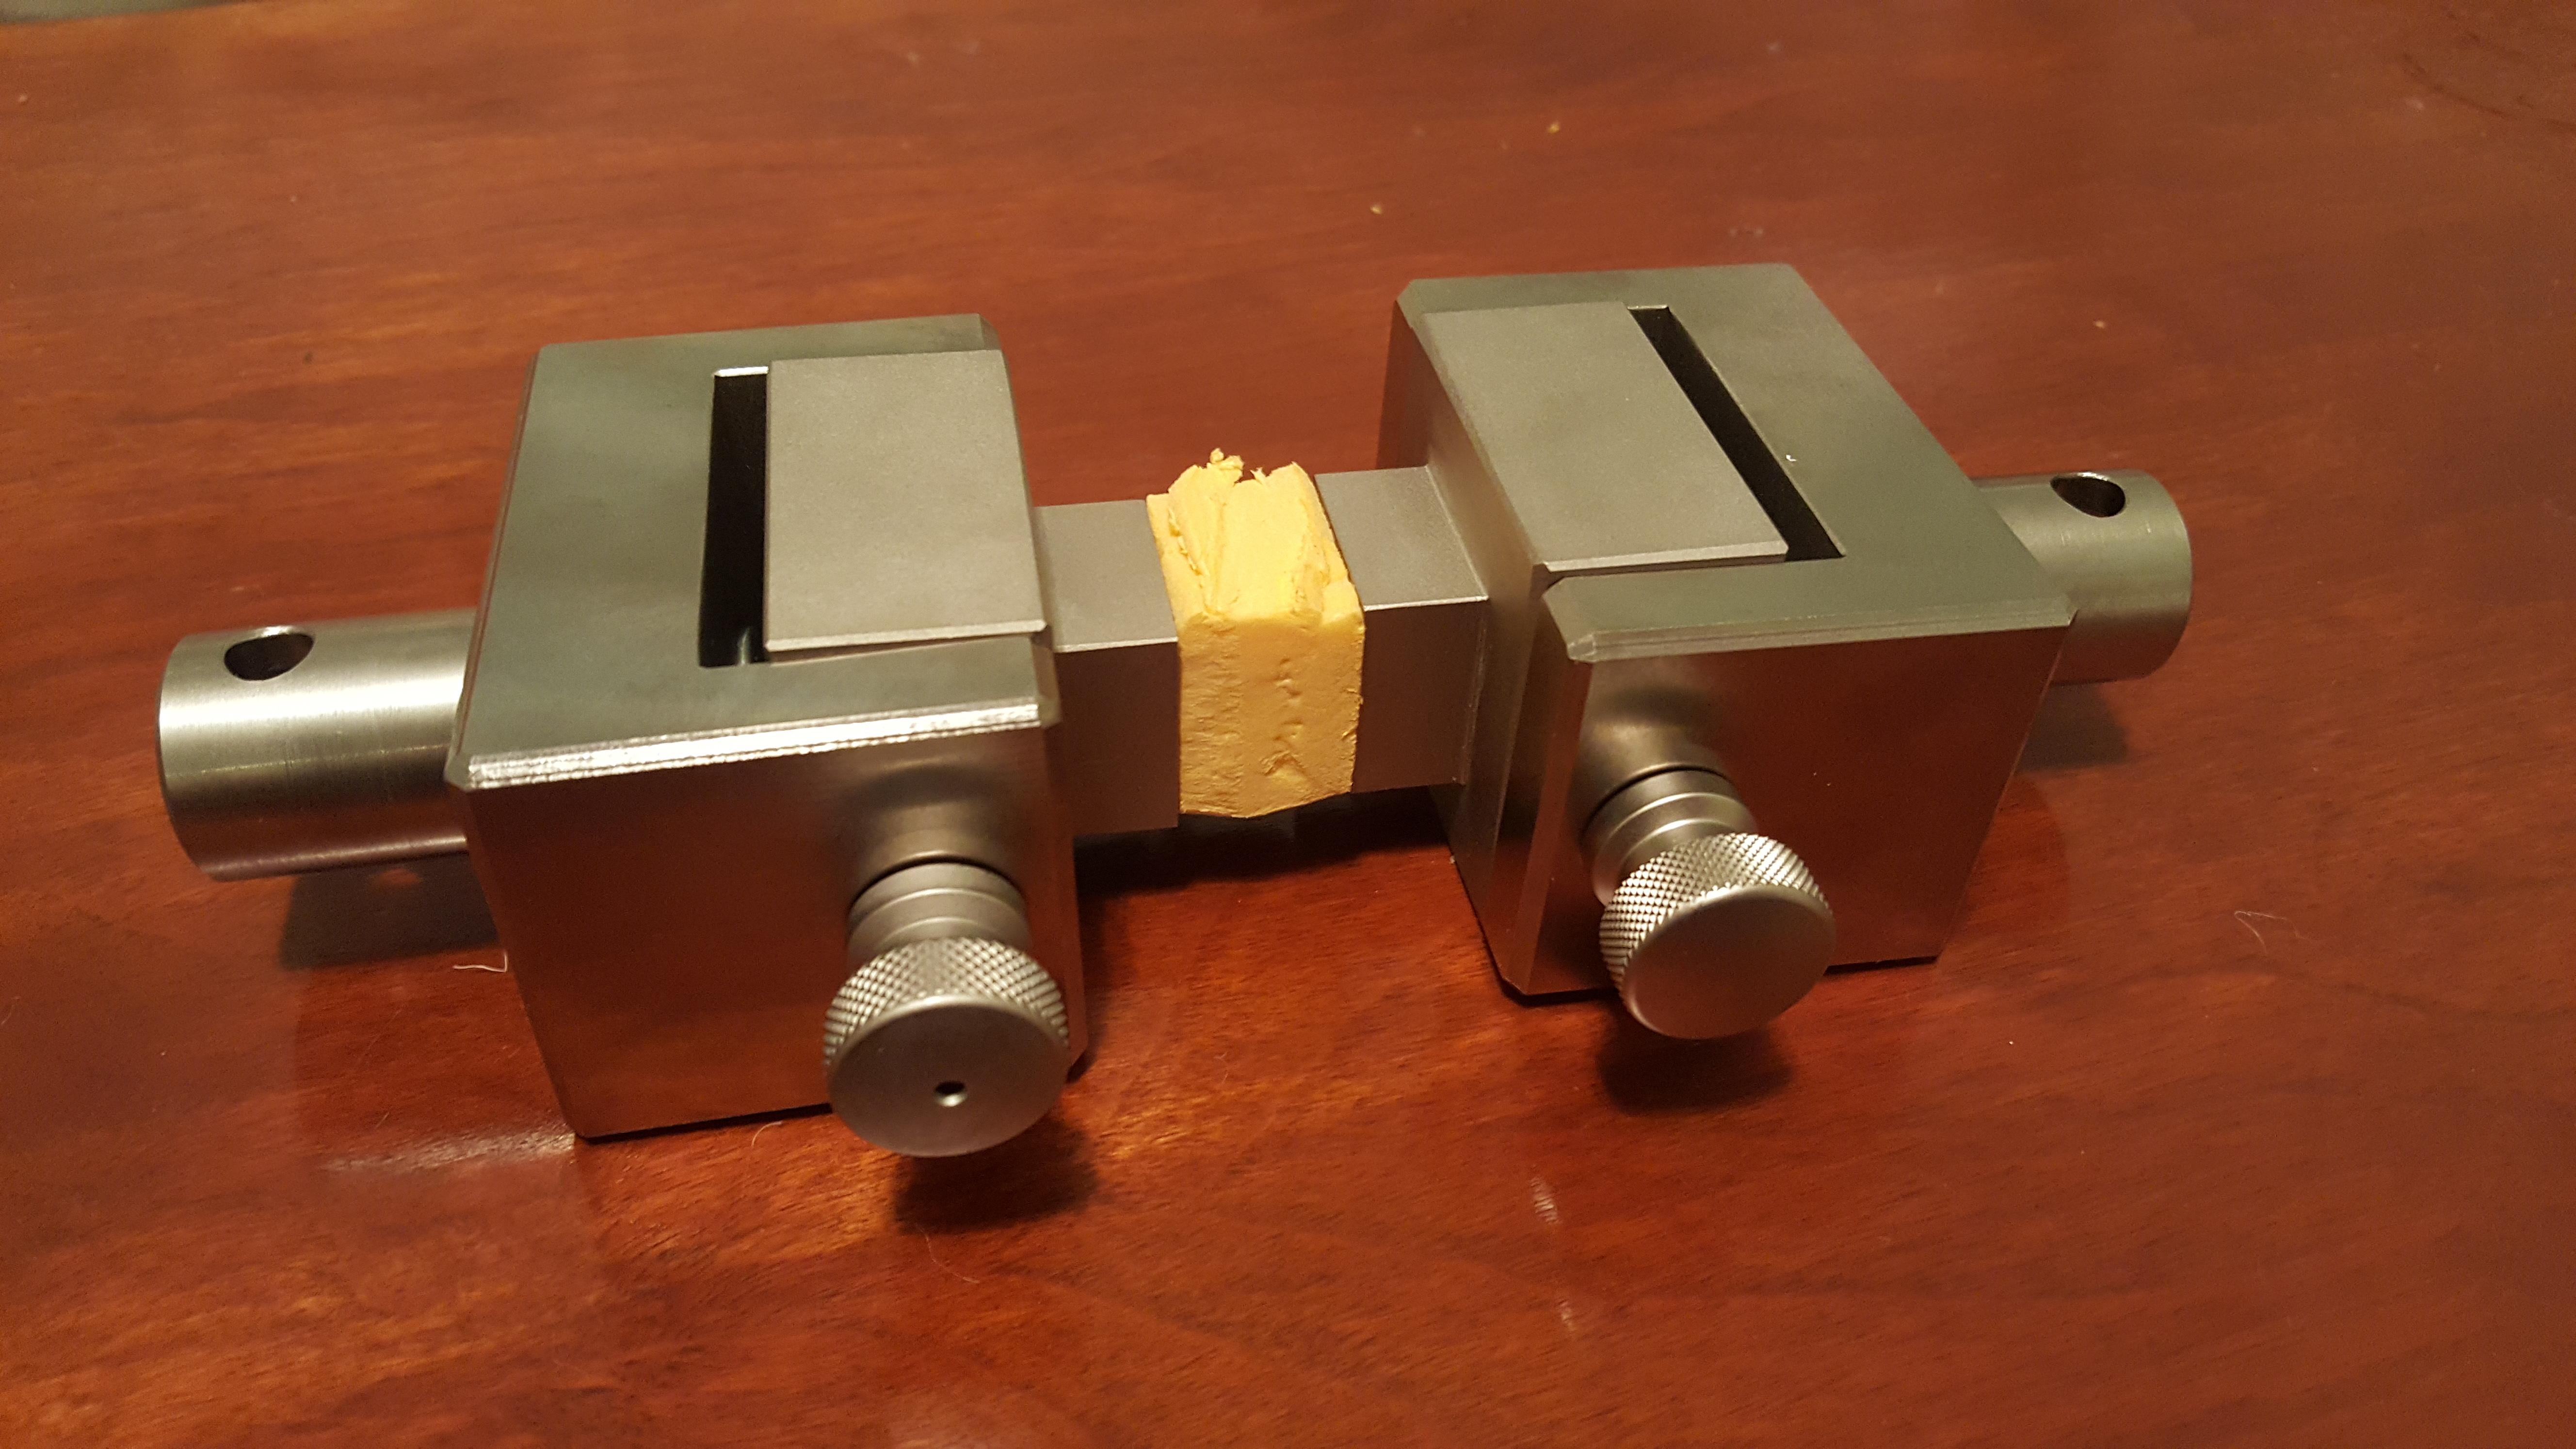 ASTM C297 Fixture for tensile testing